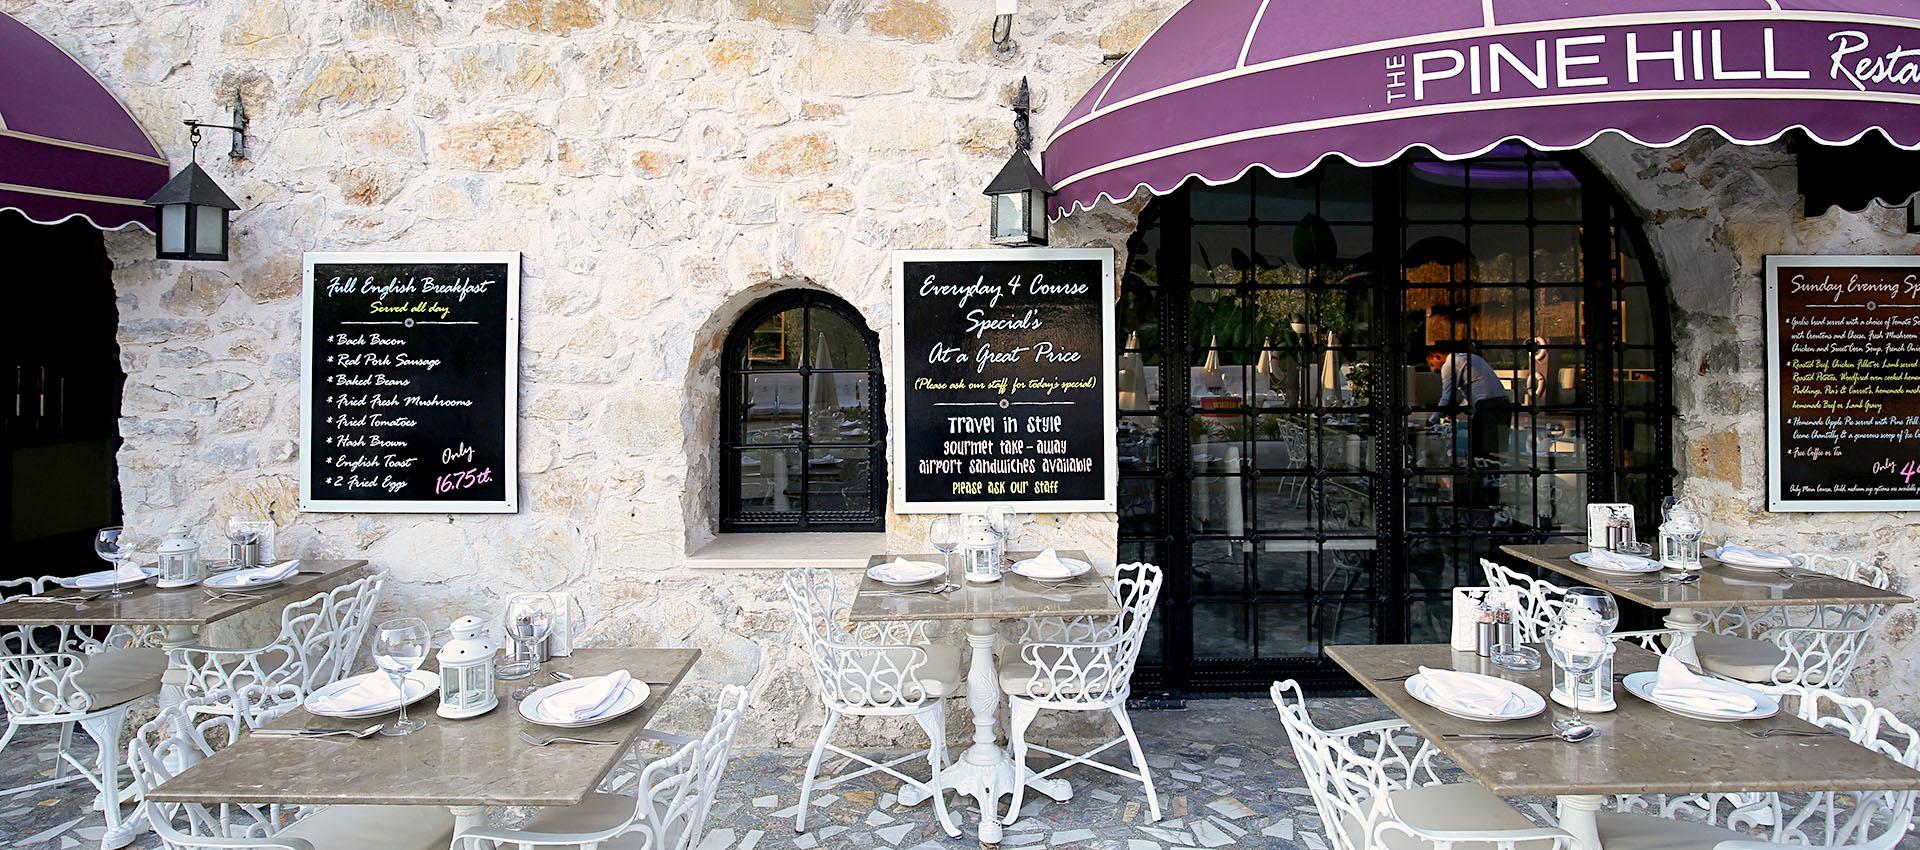 the pine hill restaurant Hisarönü Fethiye Turkey